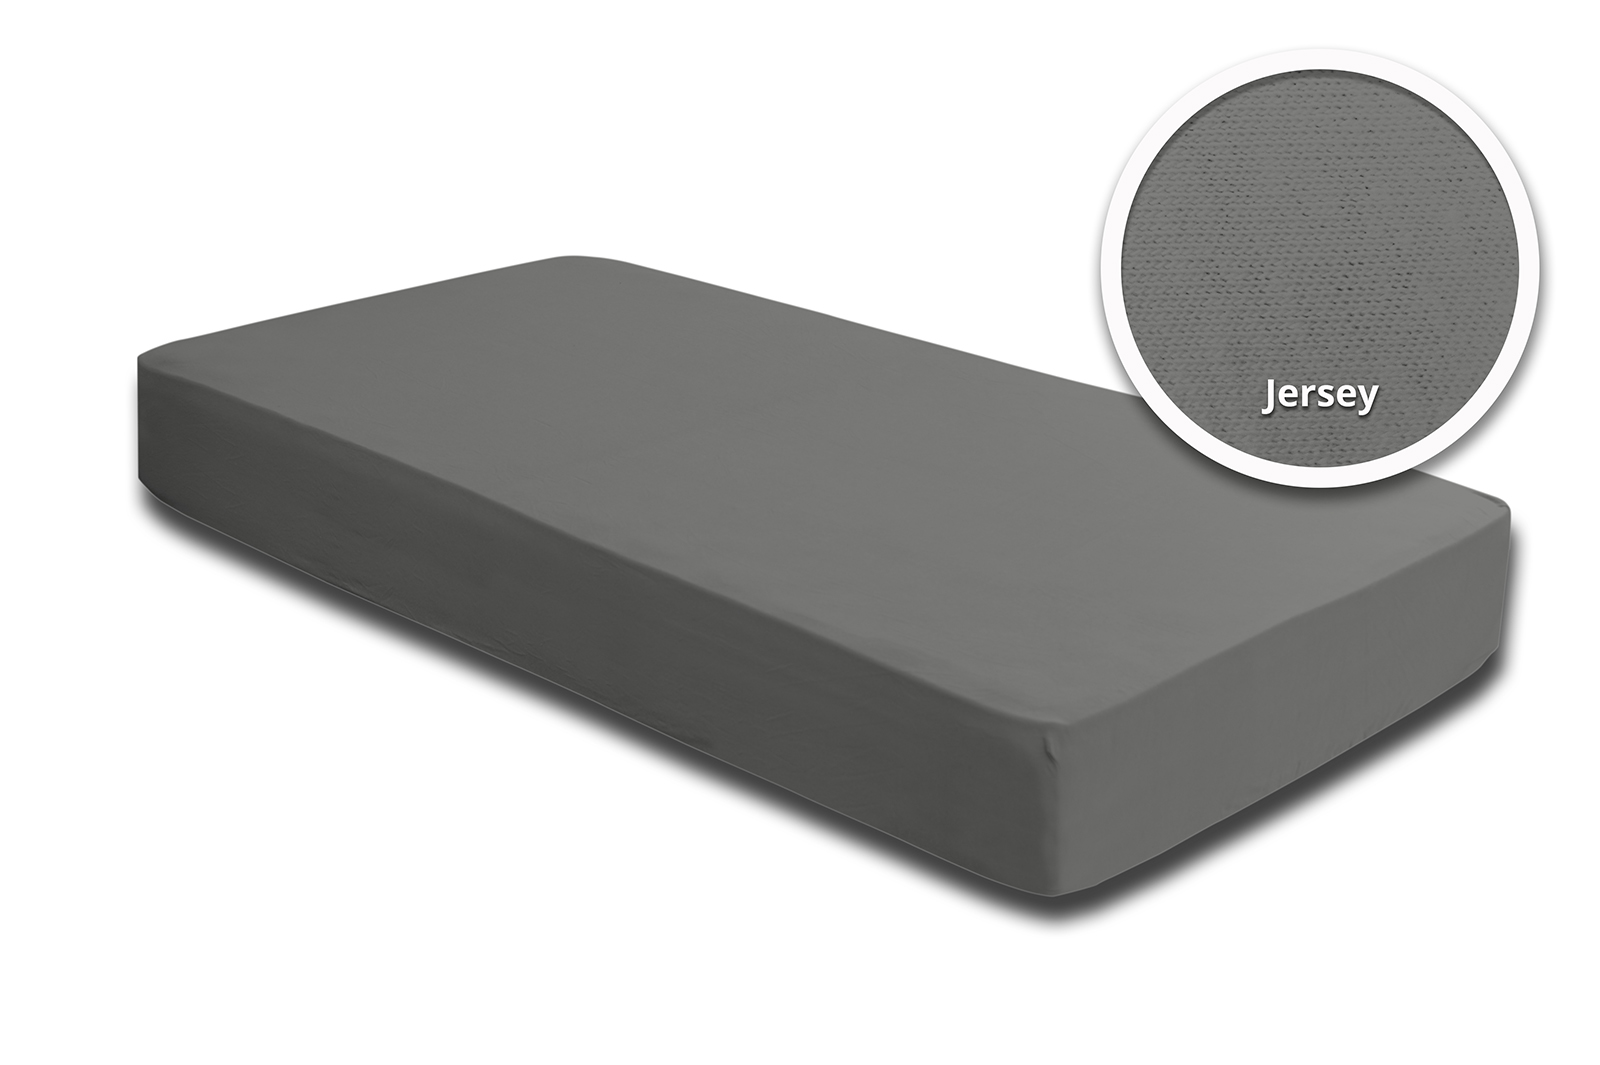 2er pack spannbettlaken bettlaken grau 120x200 cm 130x200 cm jersey baumwolle spannbettlaken. Black Bedroom Furniture Sets. Home Design Ideas